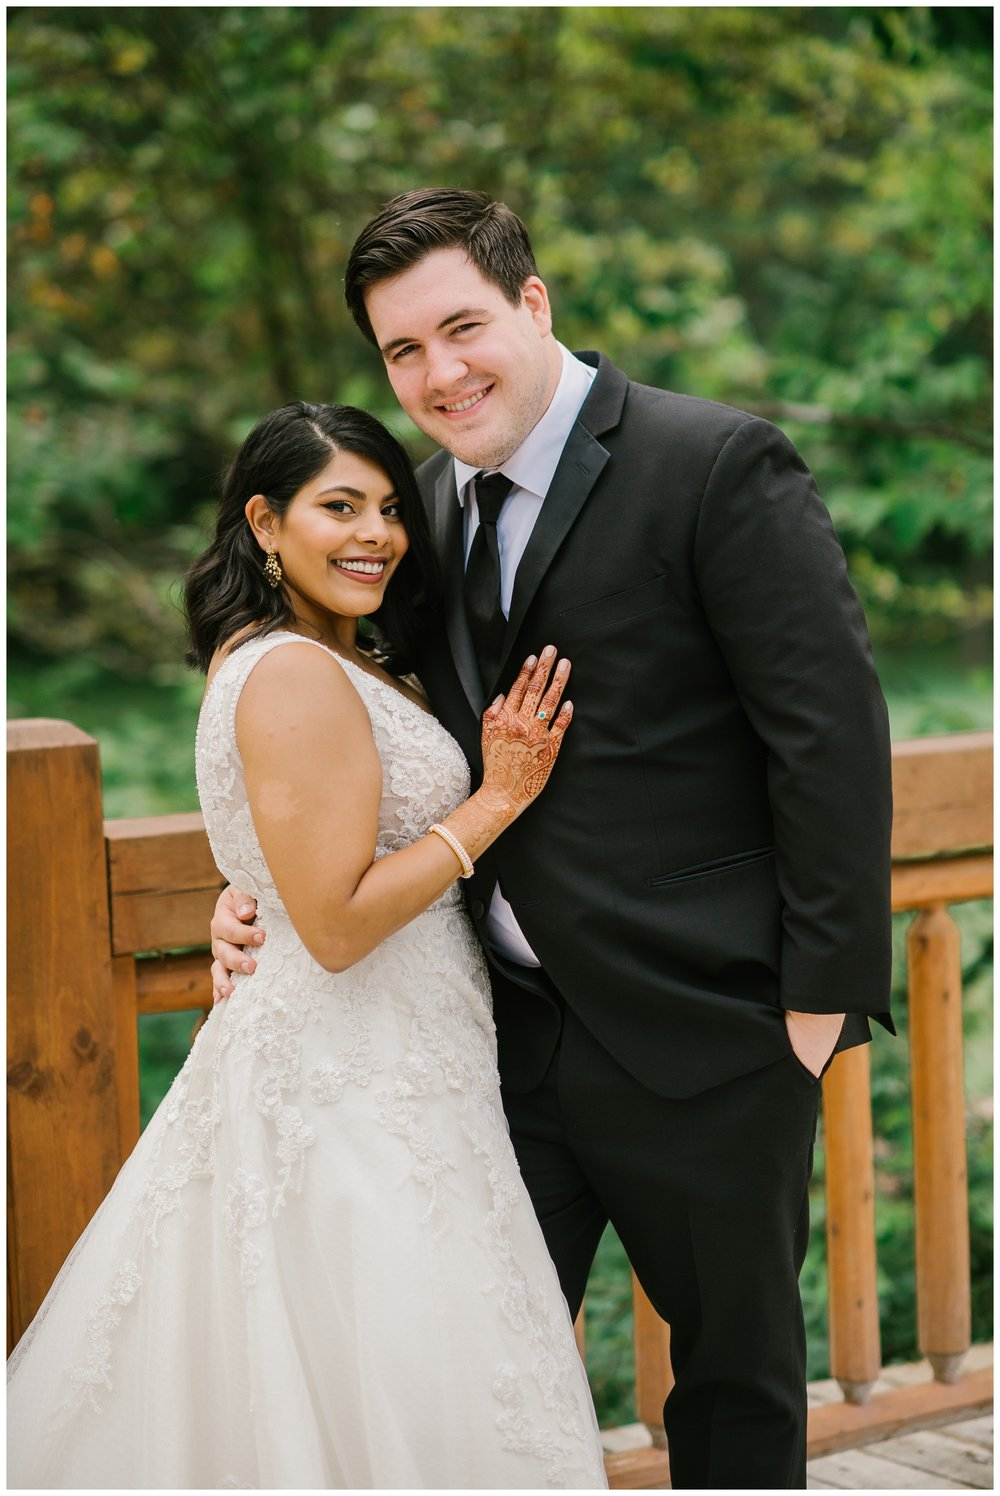 Rebecca_Bridges_Photography_Indianapolis_Wedding_Photographer_6901.jpg